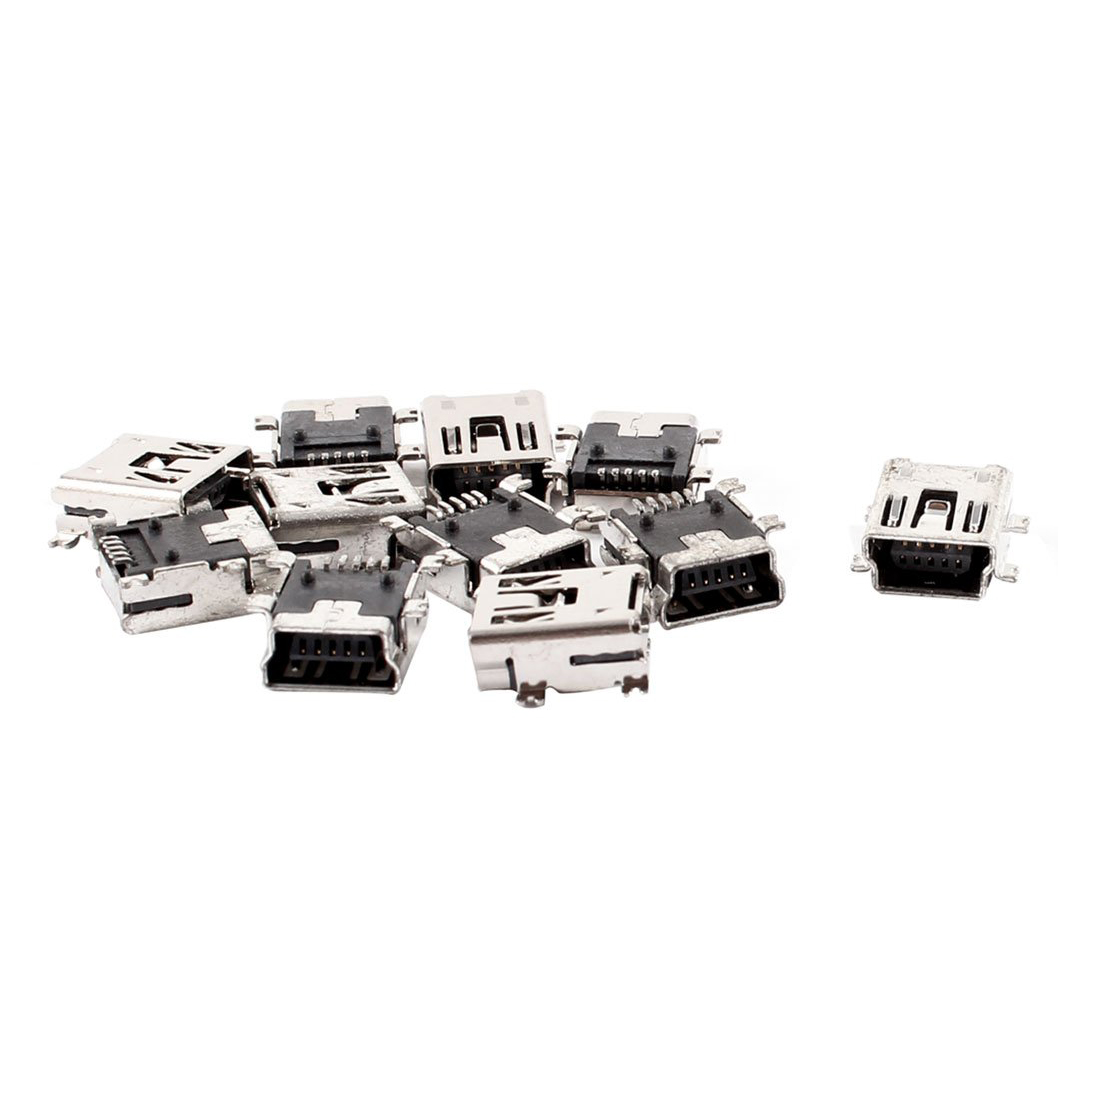 mini usb type b female 5 pin pcb board mount jack connector 10 pcs